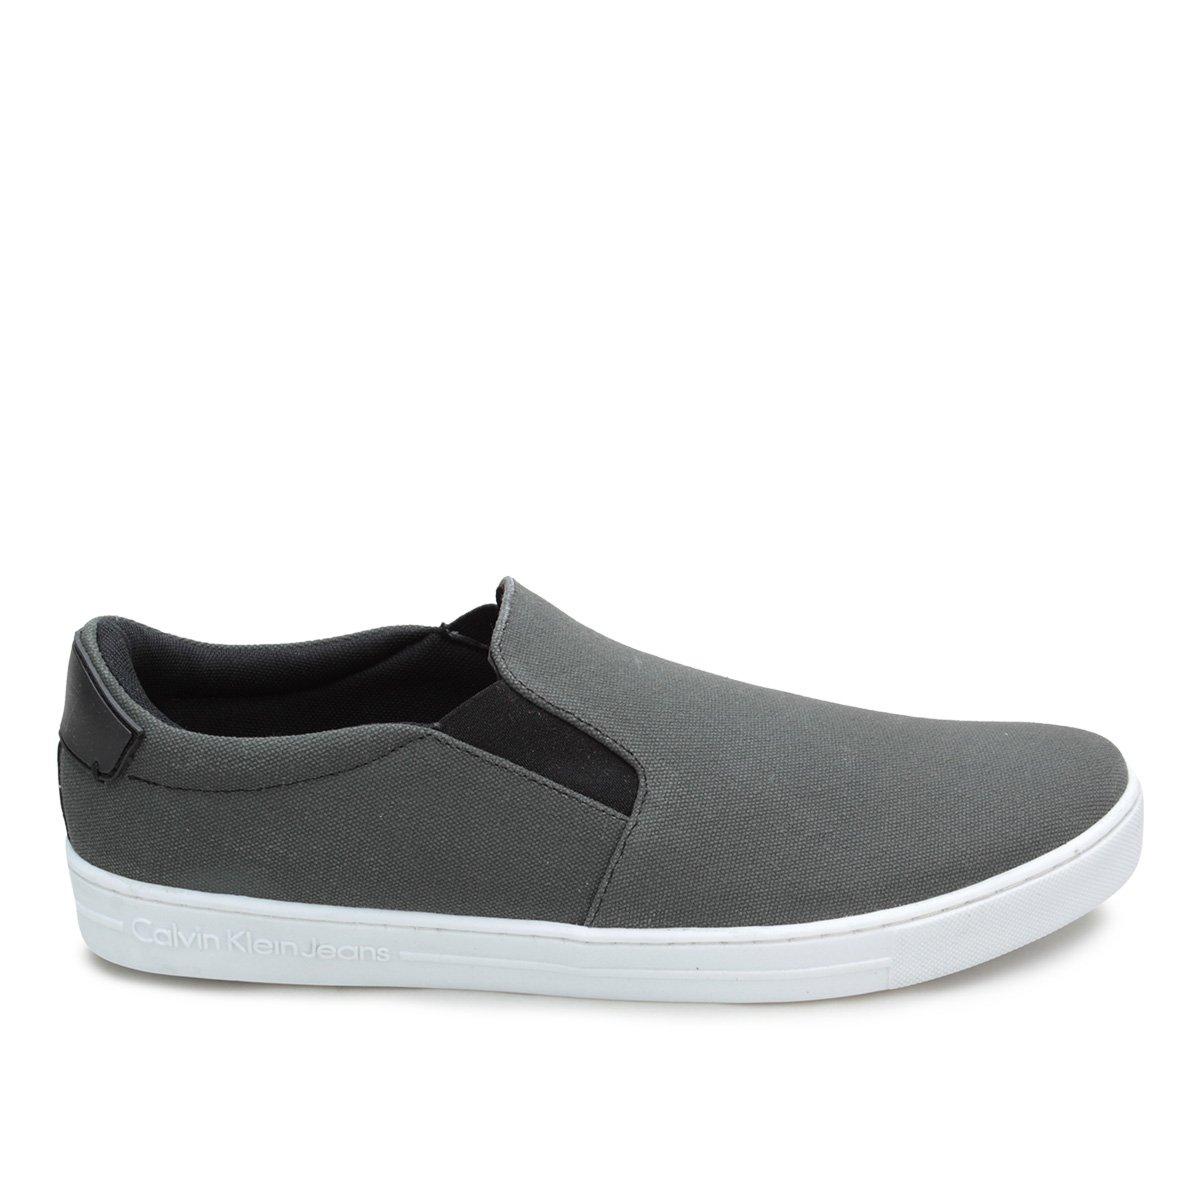 d8c311814a079 Slip On Calvin Klein Iate Lona Masculino - Compre Agora   Netshoes